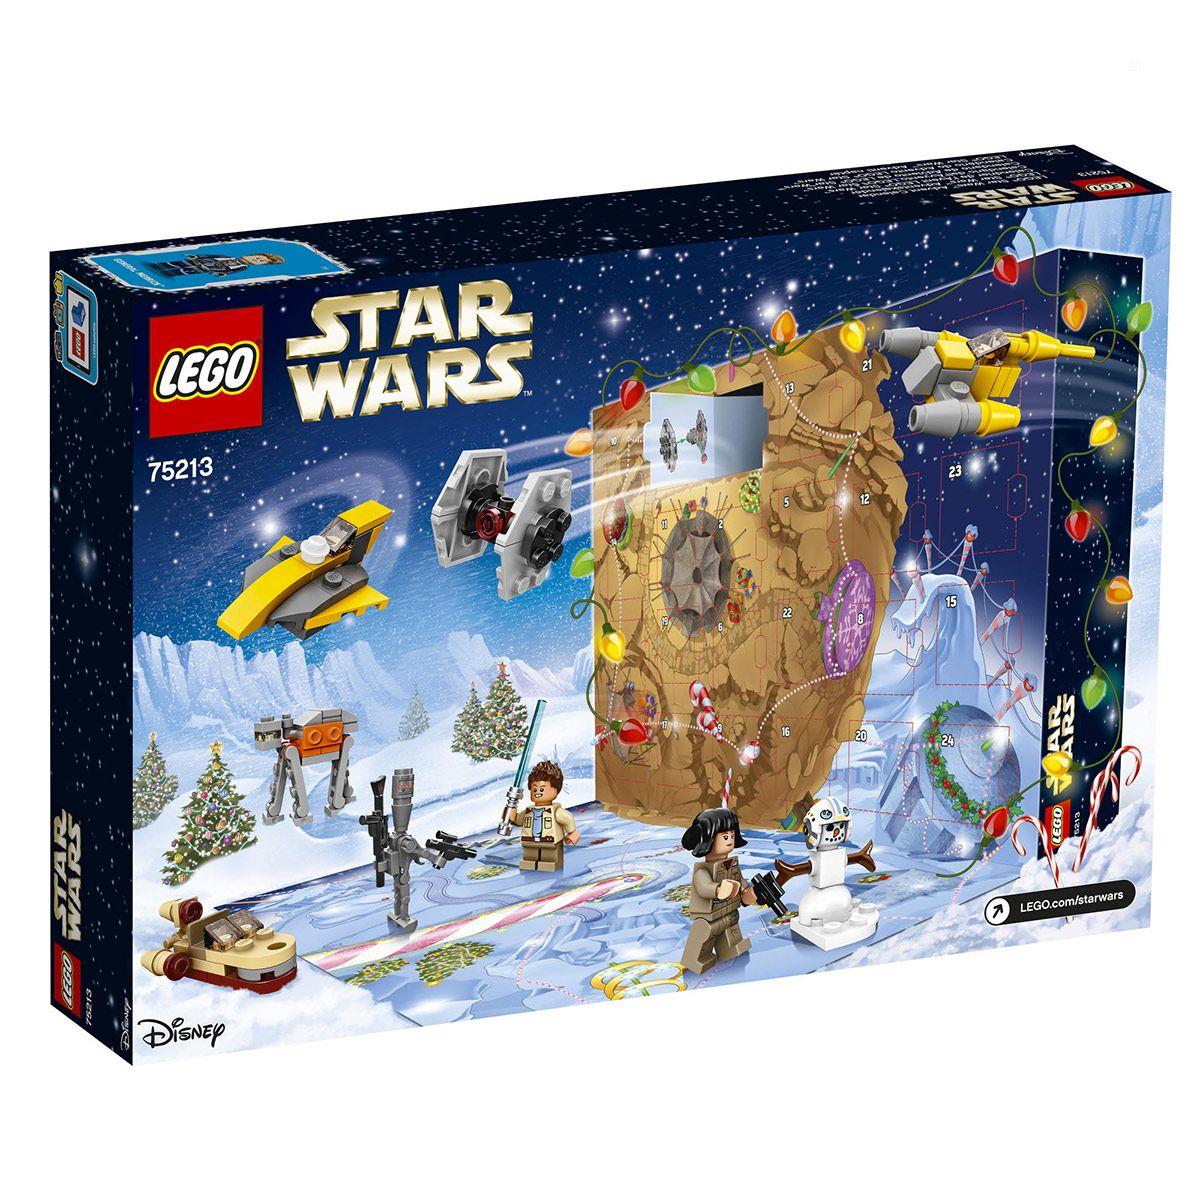 Lego Calendrier.Calendrier De L Avent Lego Star Wars 75213 Jeux De